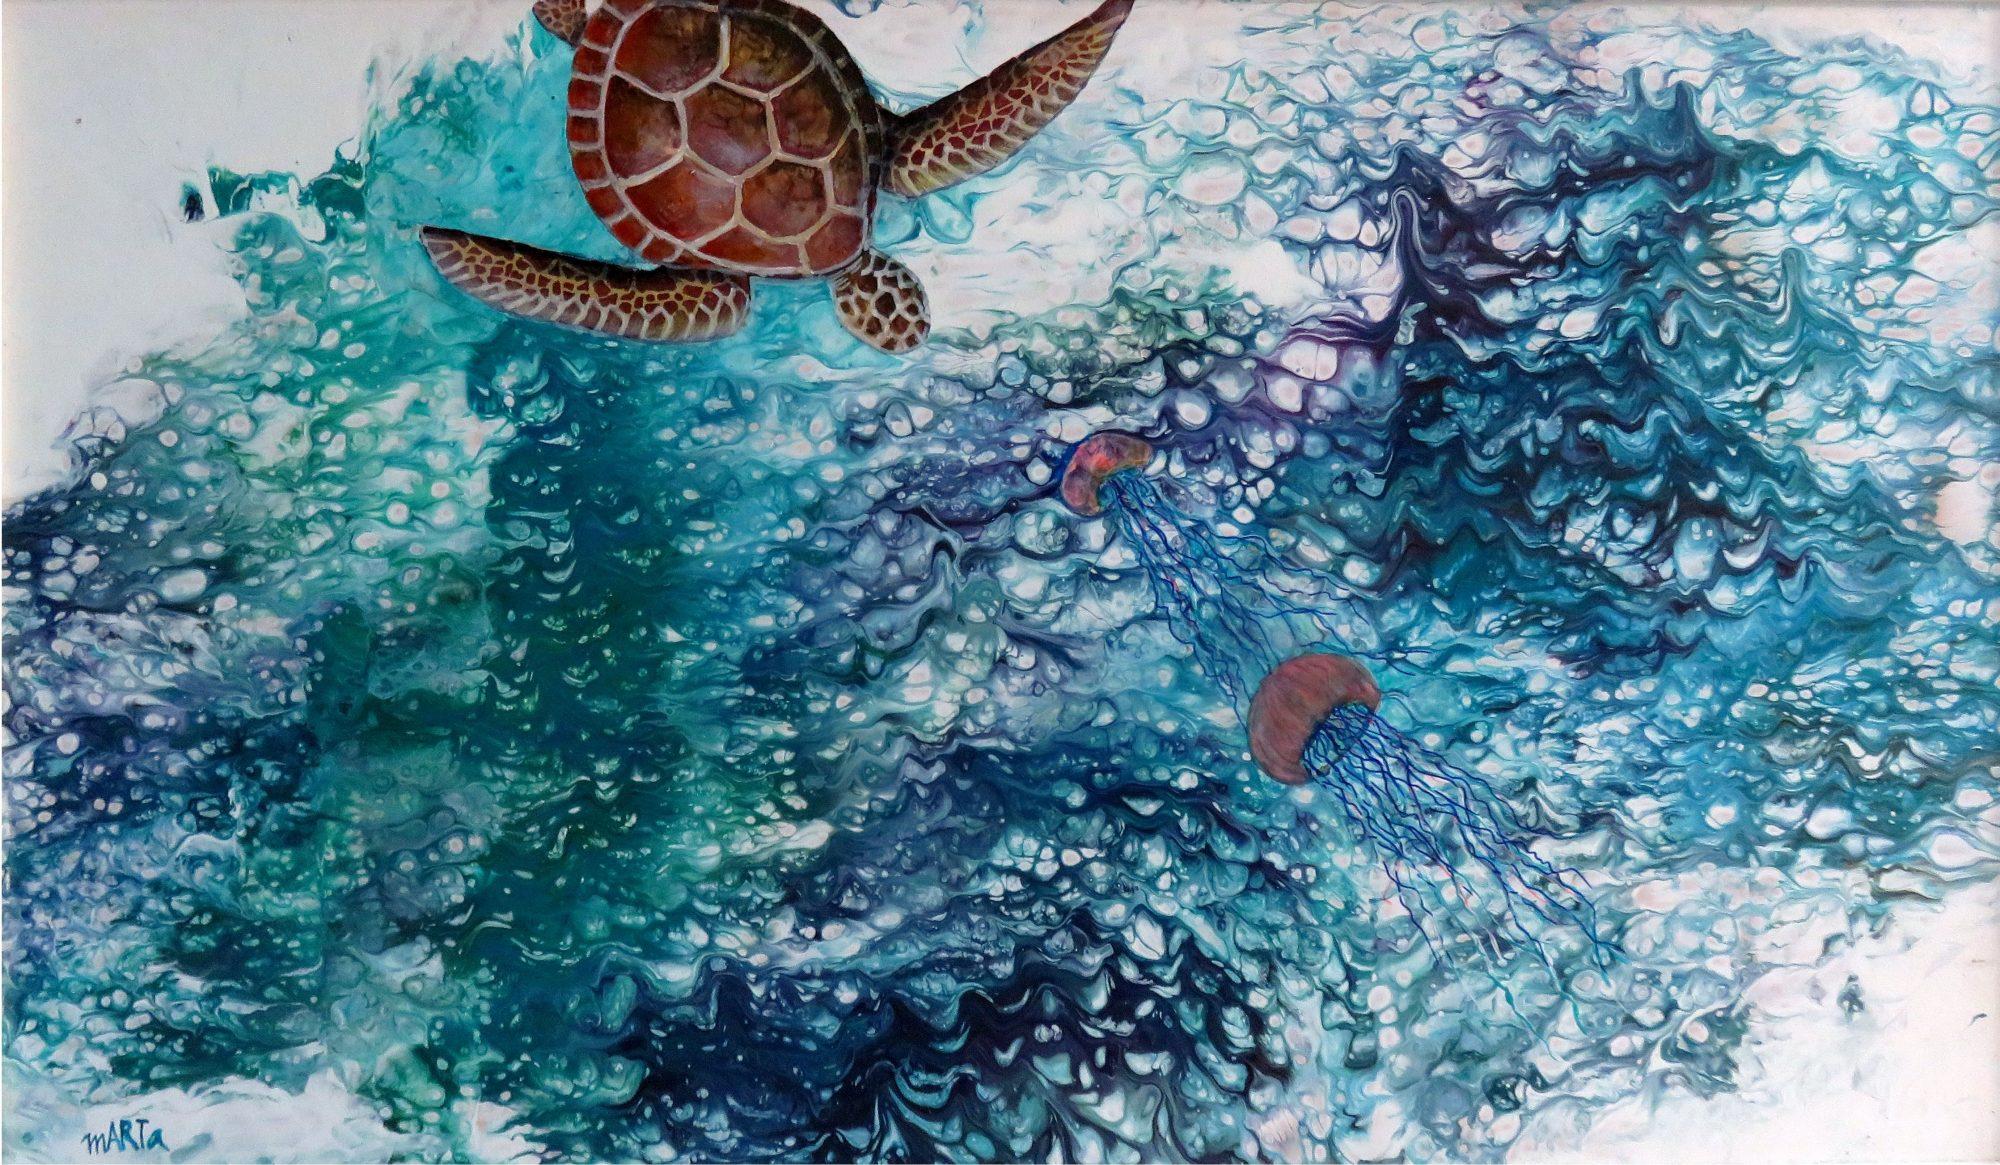 #25 Ocean Life.id 4102